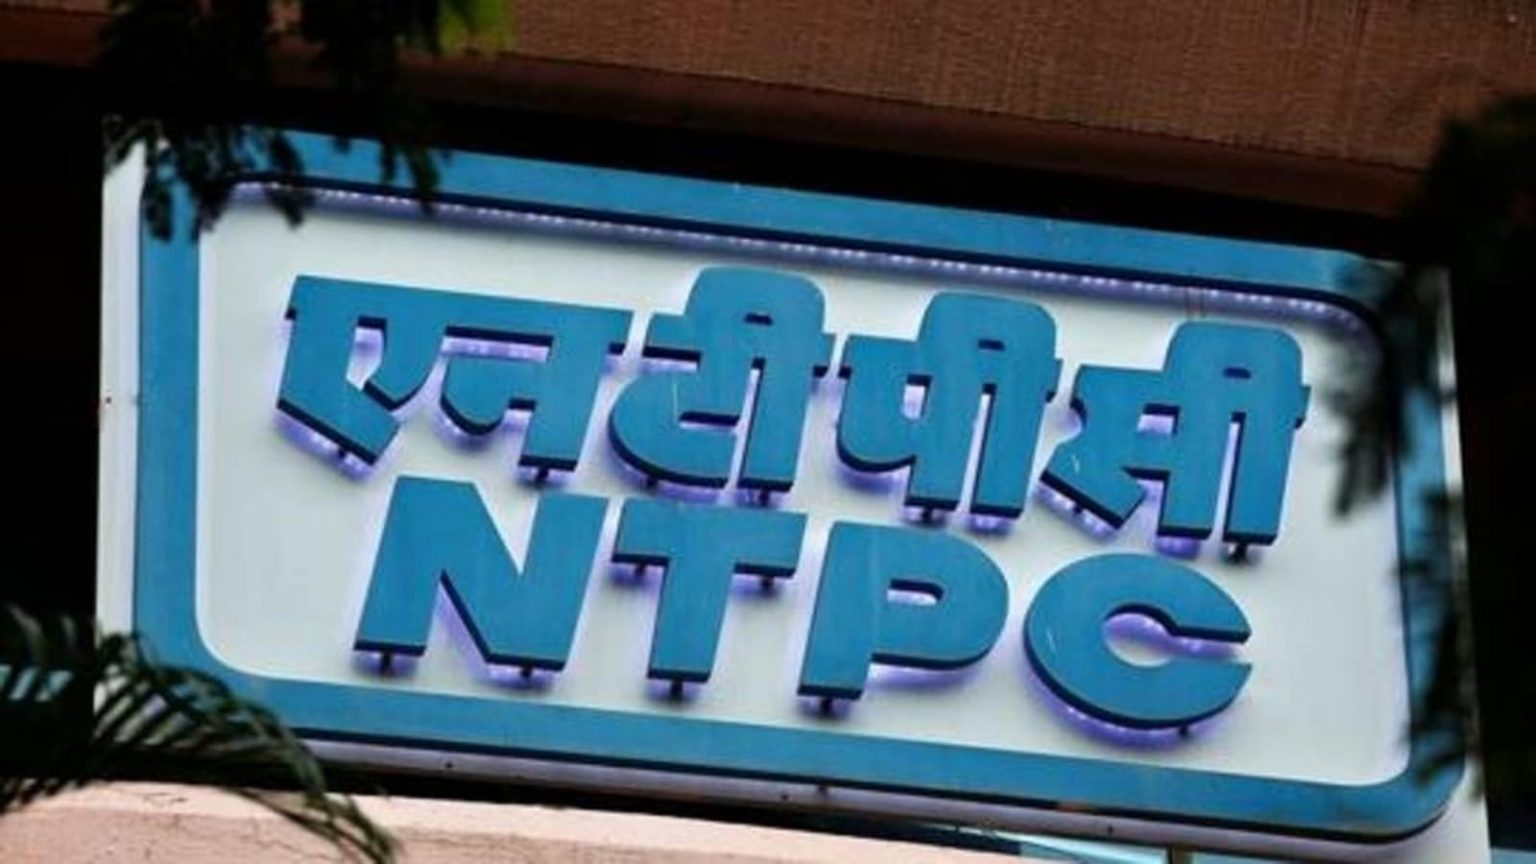 NTPC wins recognition of India's best employers among Nation-Builders 2021 | నేషన్ బిల్డర్స్ 2021 లో ఎన్టిపిసి భారతదేశపు ఉత్తమ యజమానులుగా గుర్తింపును పొందినది |_40.1